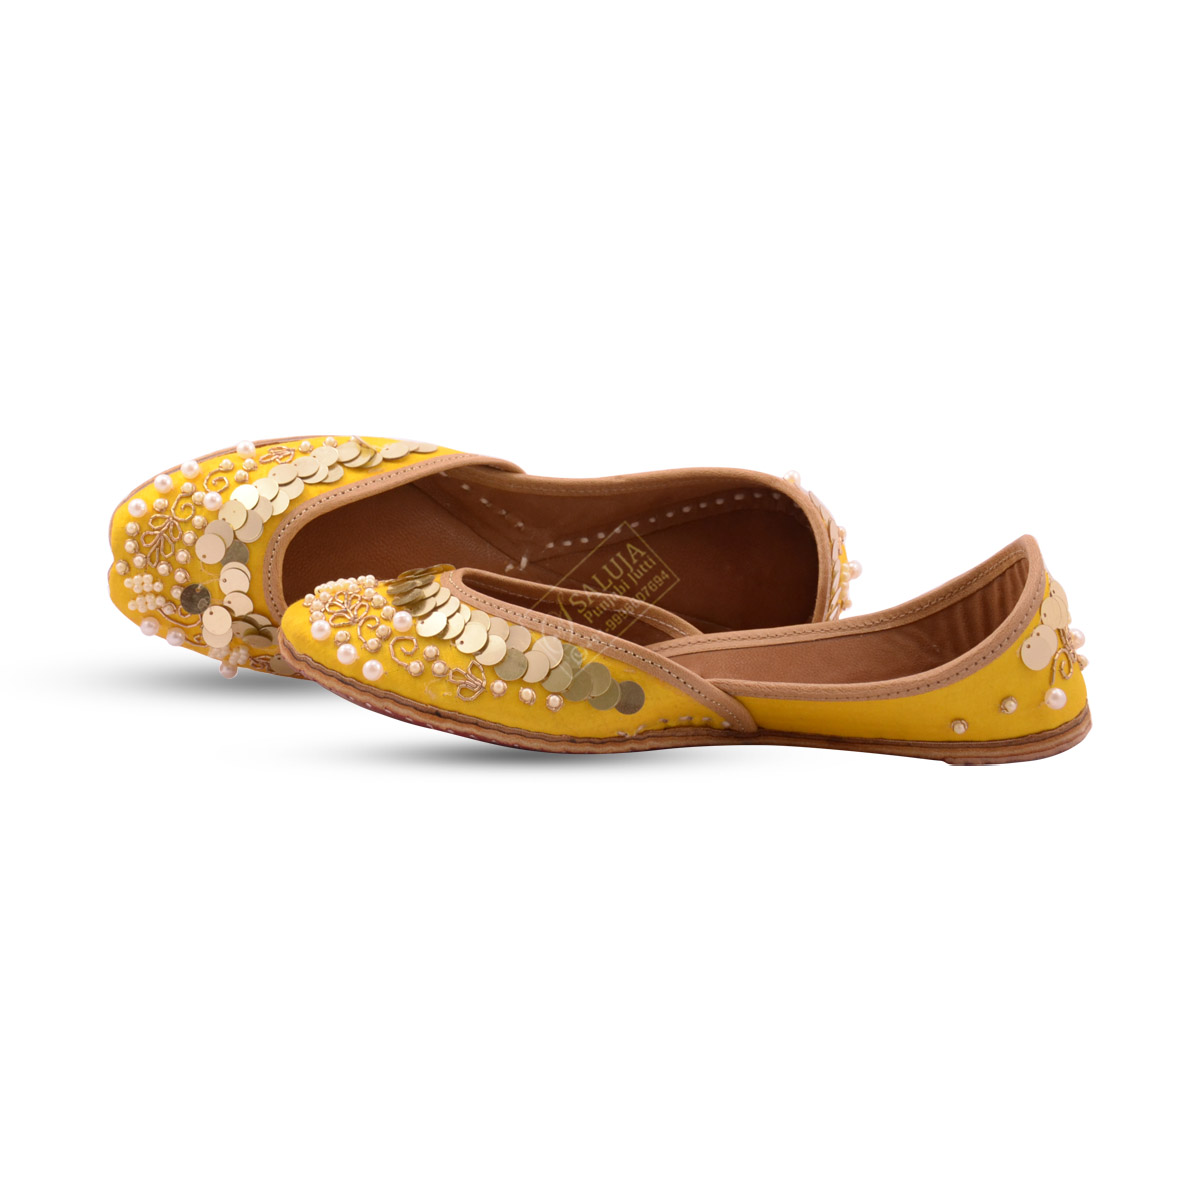 Nagra Shoes For Ladies ethnic footwear